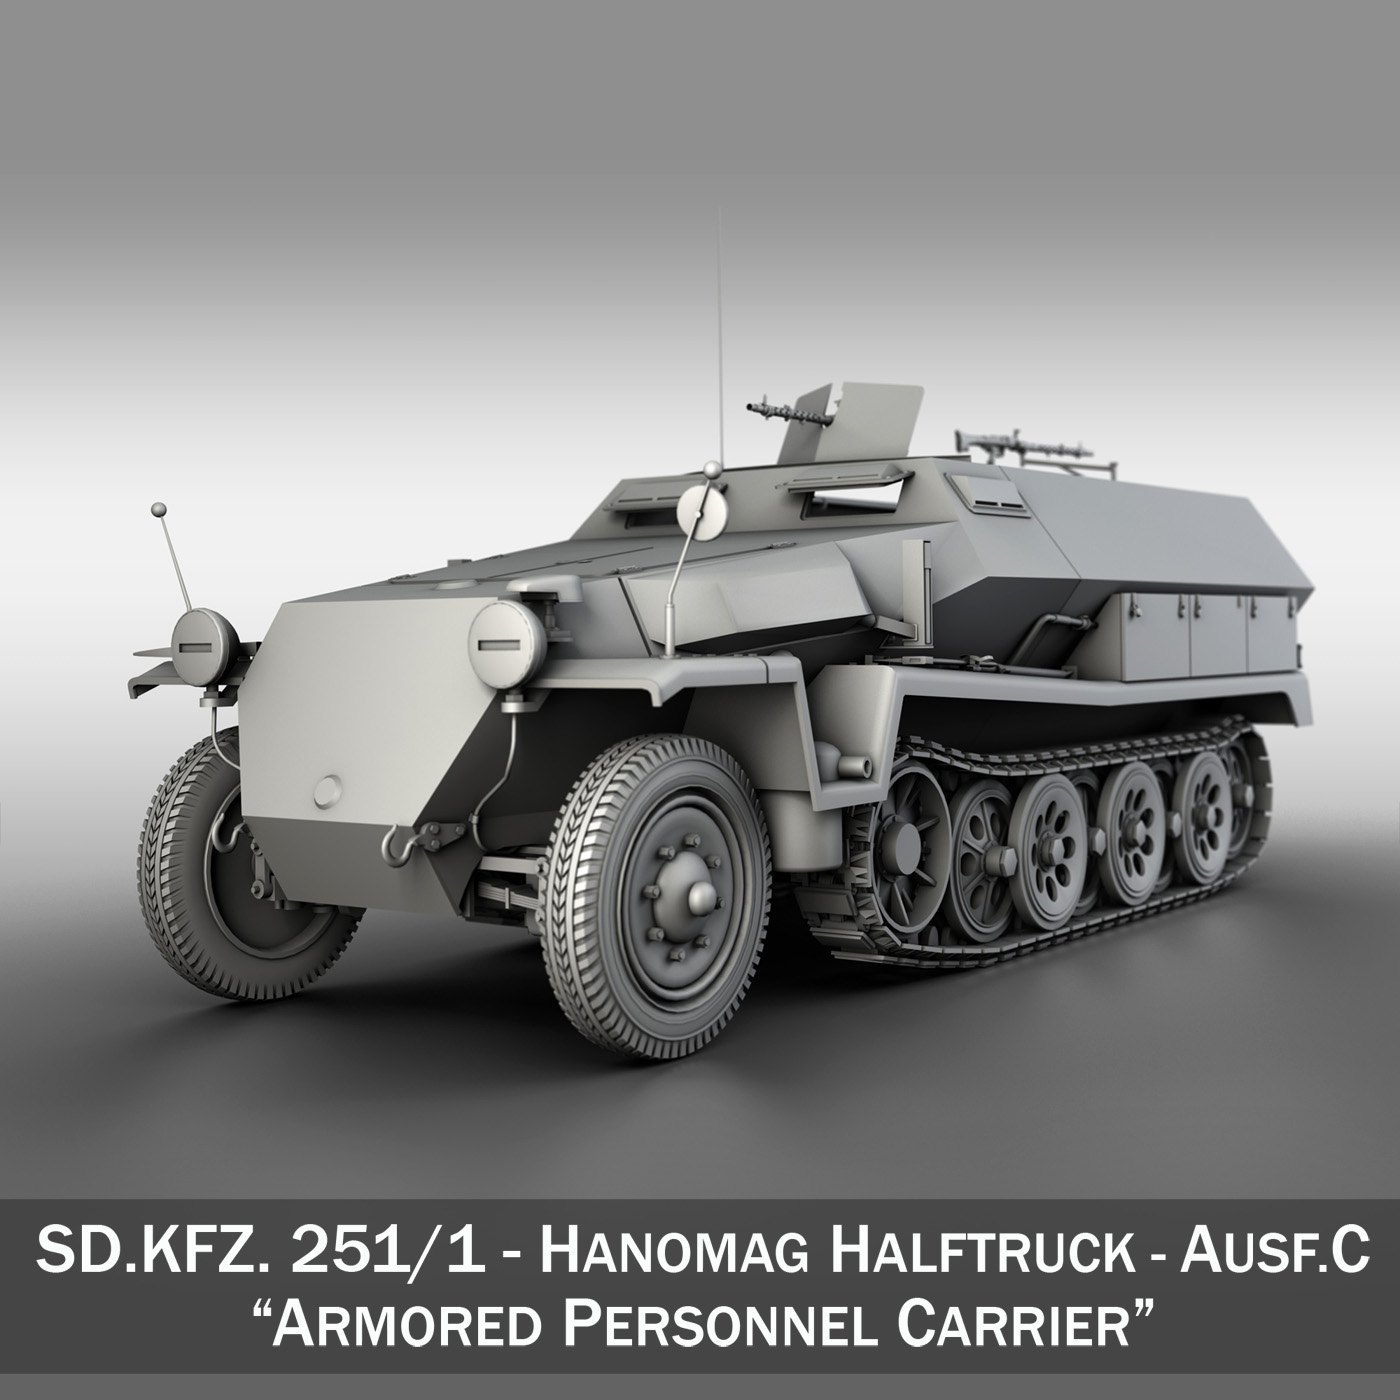 sd.kfz 251/1 ausf.c – hanomag halftruck 3d model 3ds fbx c4d lwo obj 201163